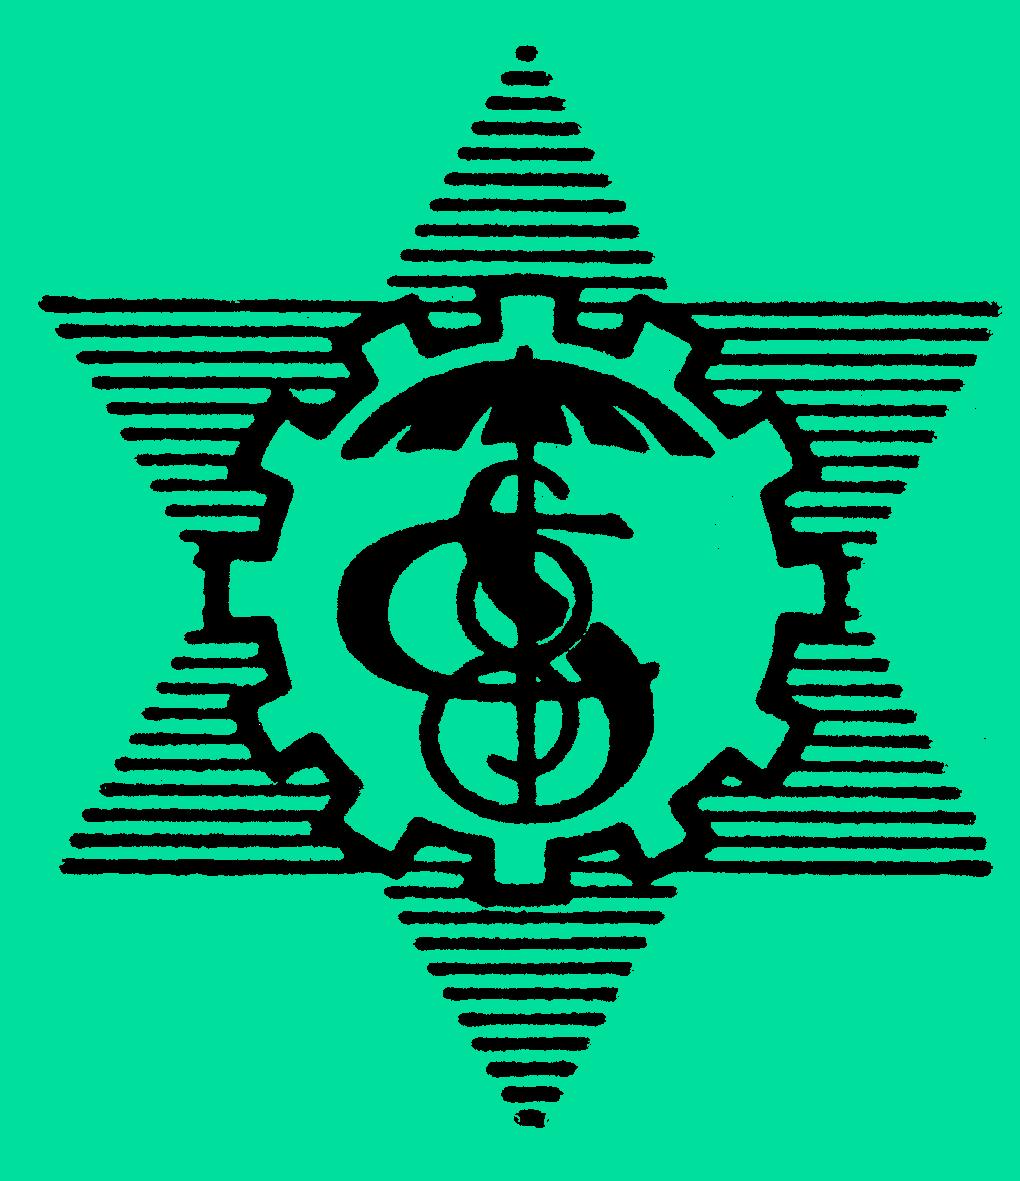 Logo Carl Schirm